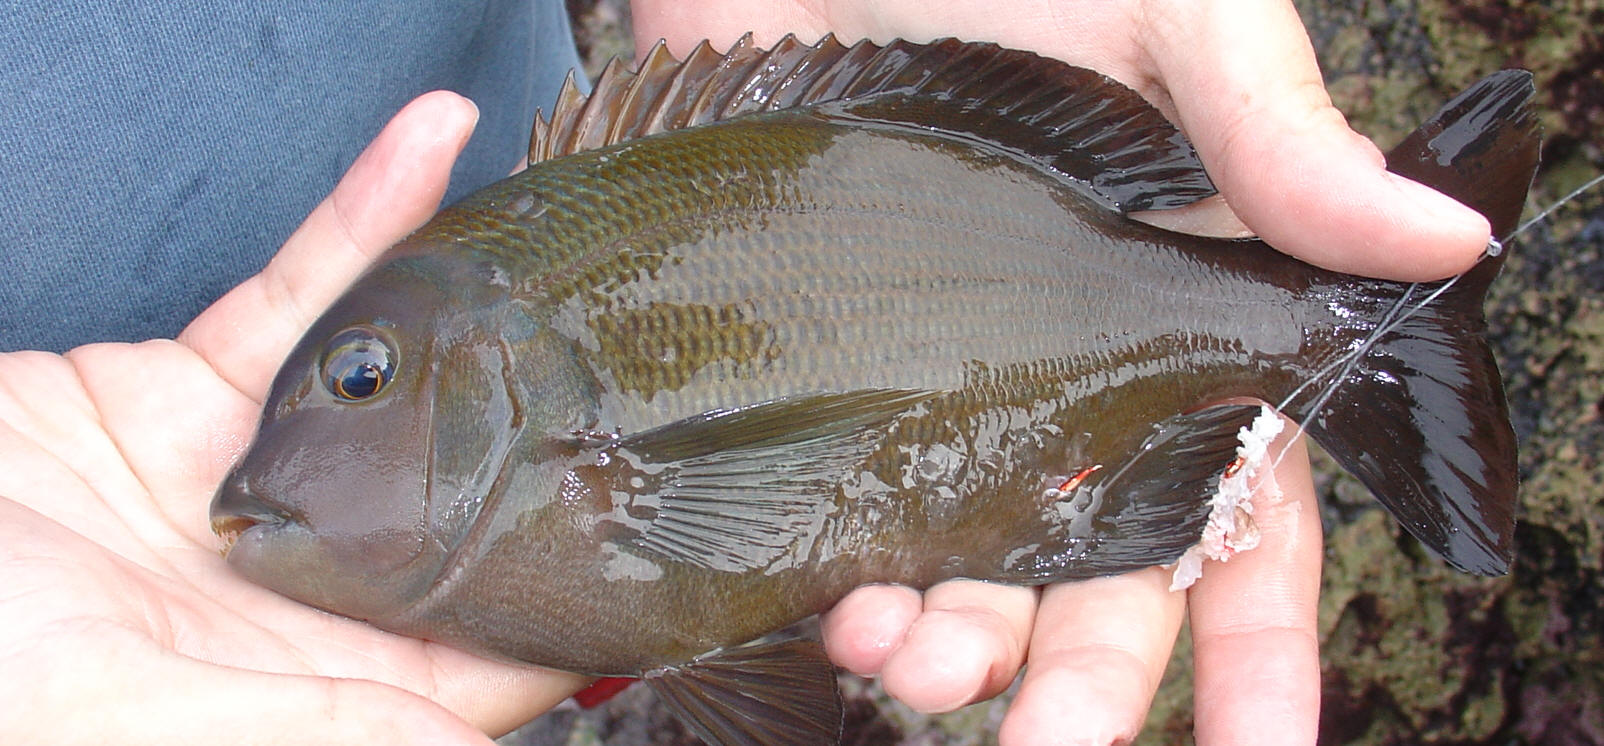 Freshwater aquarium fish in south africa - Freshwater Aquarium Fish In South Africa